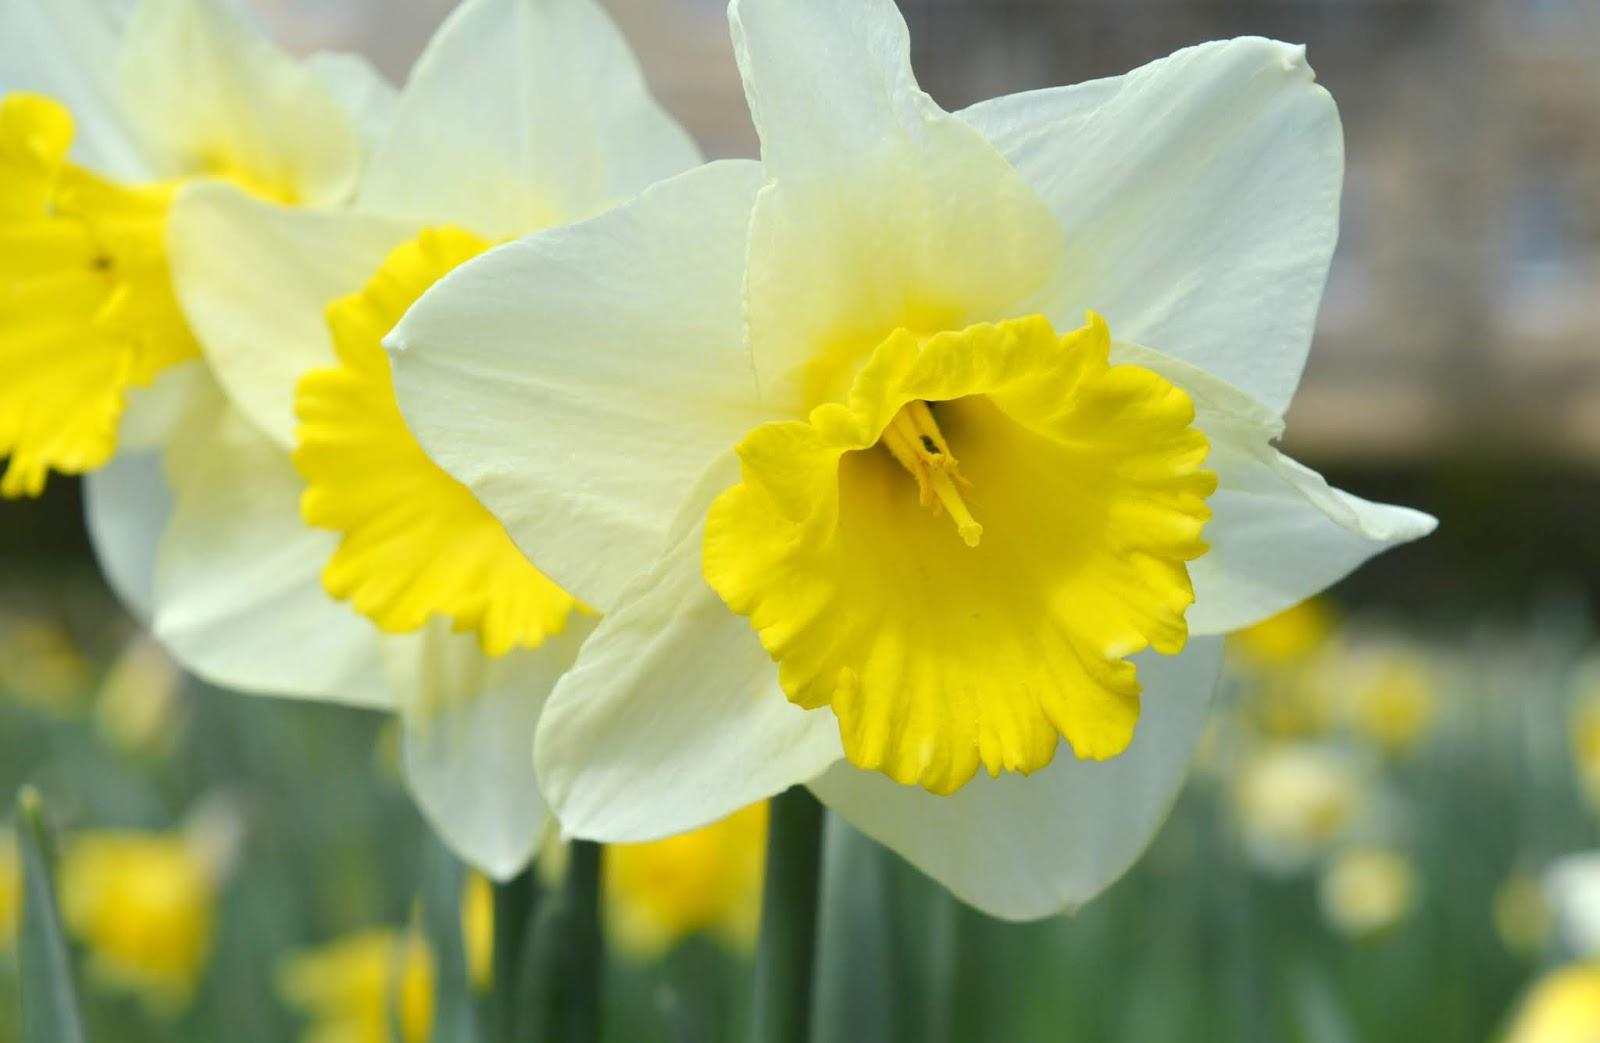 Howick Hall, Northumberland - Daffodil Season